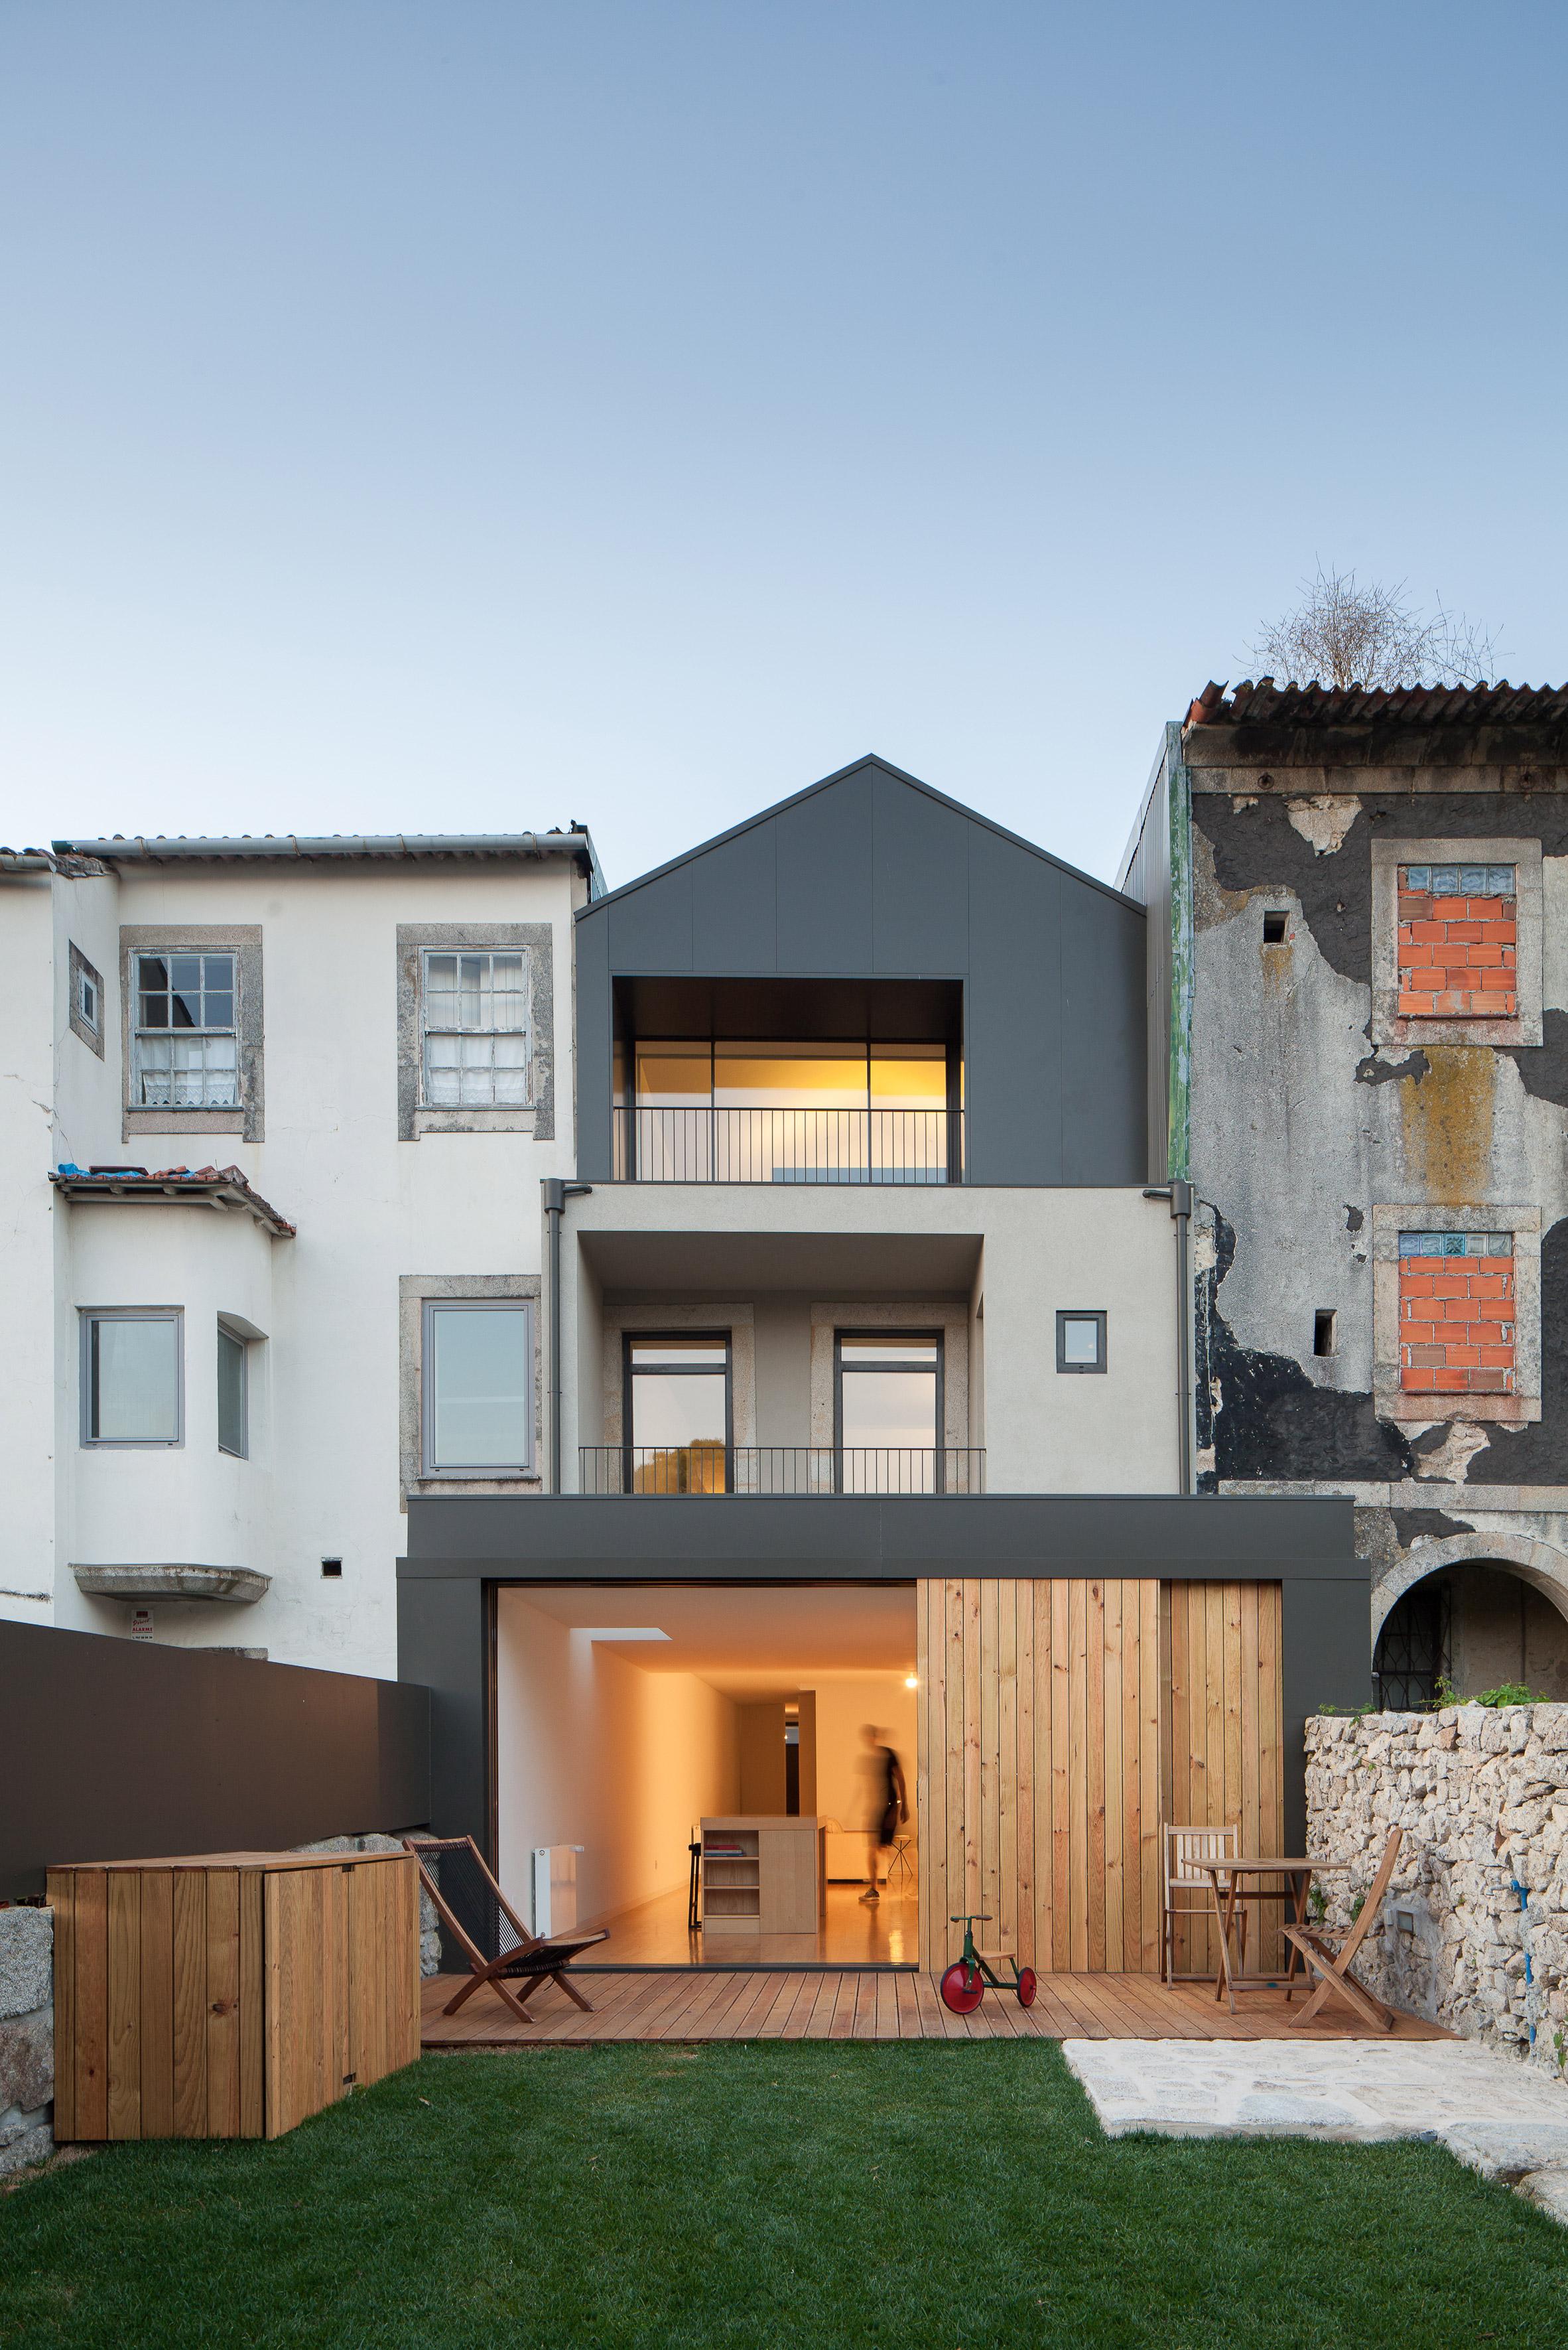 Casa Boavista is a renovated Porto townhouse featuring three skylights